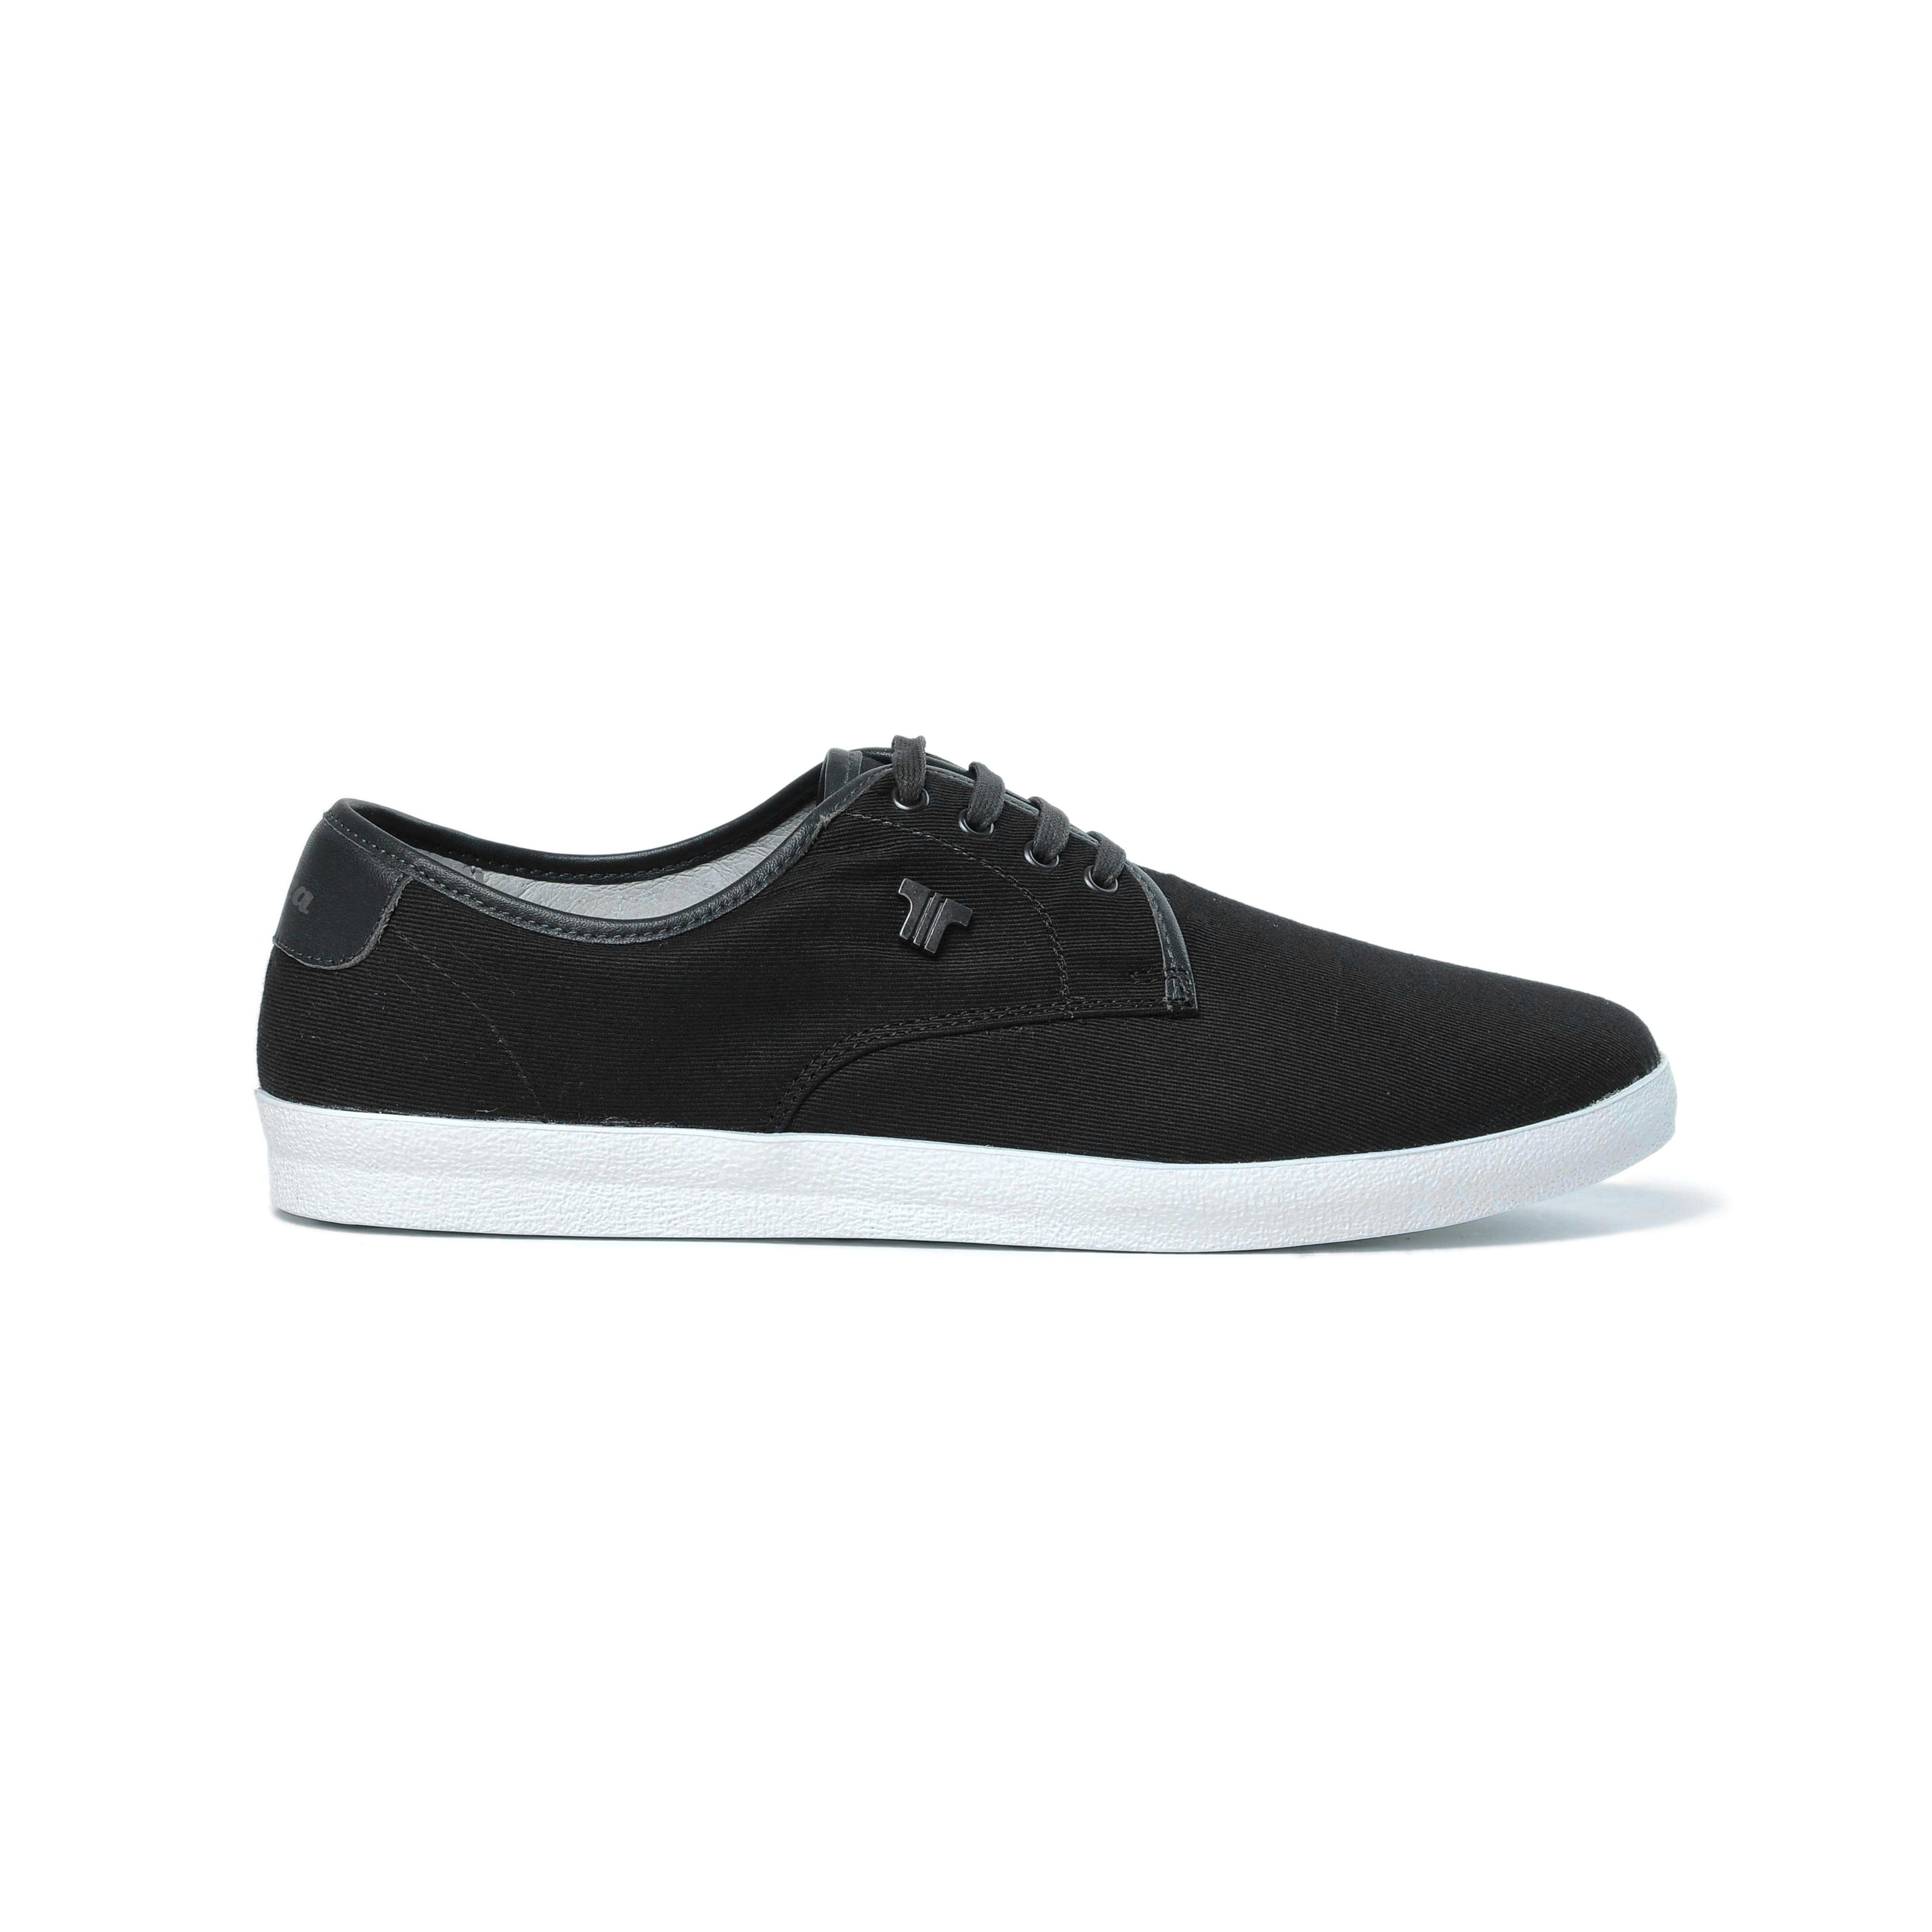 Tisza shoes - City- Black